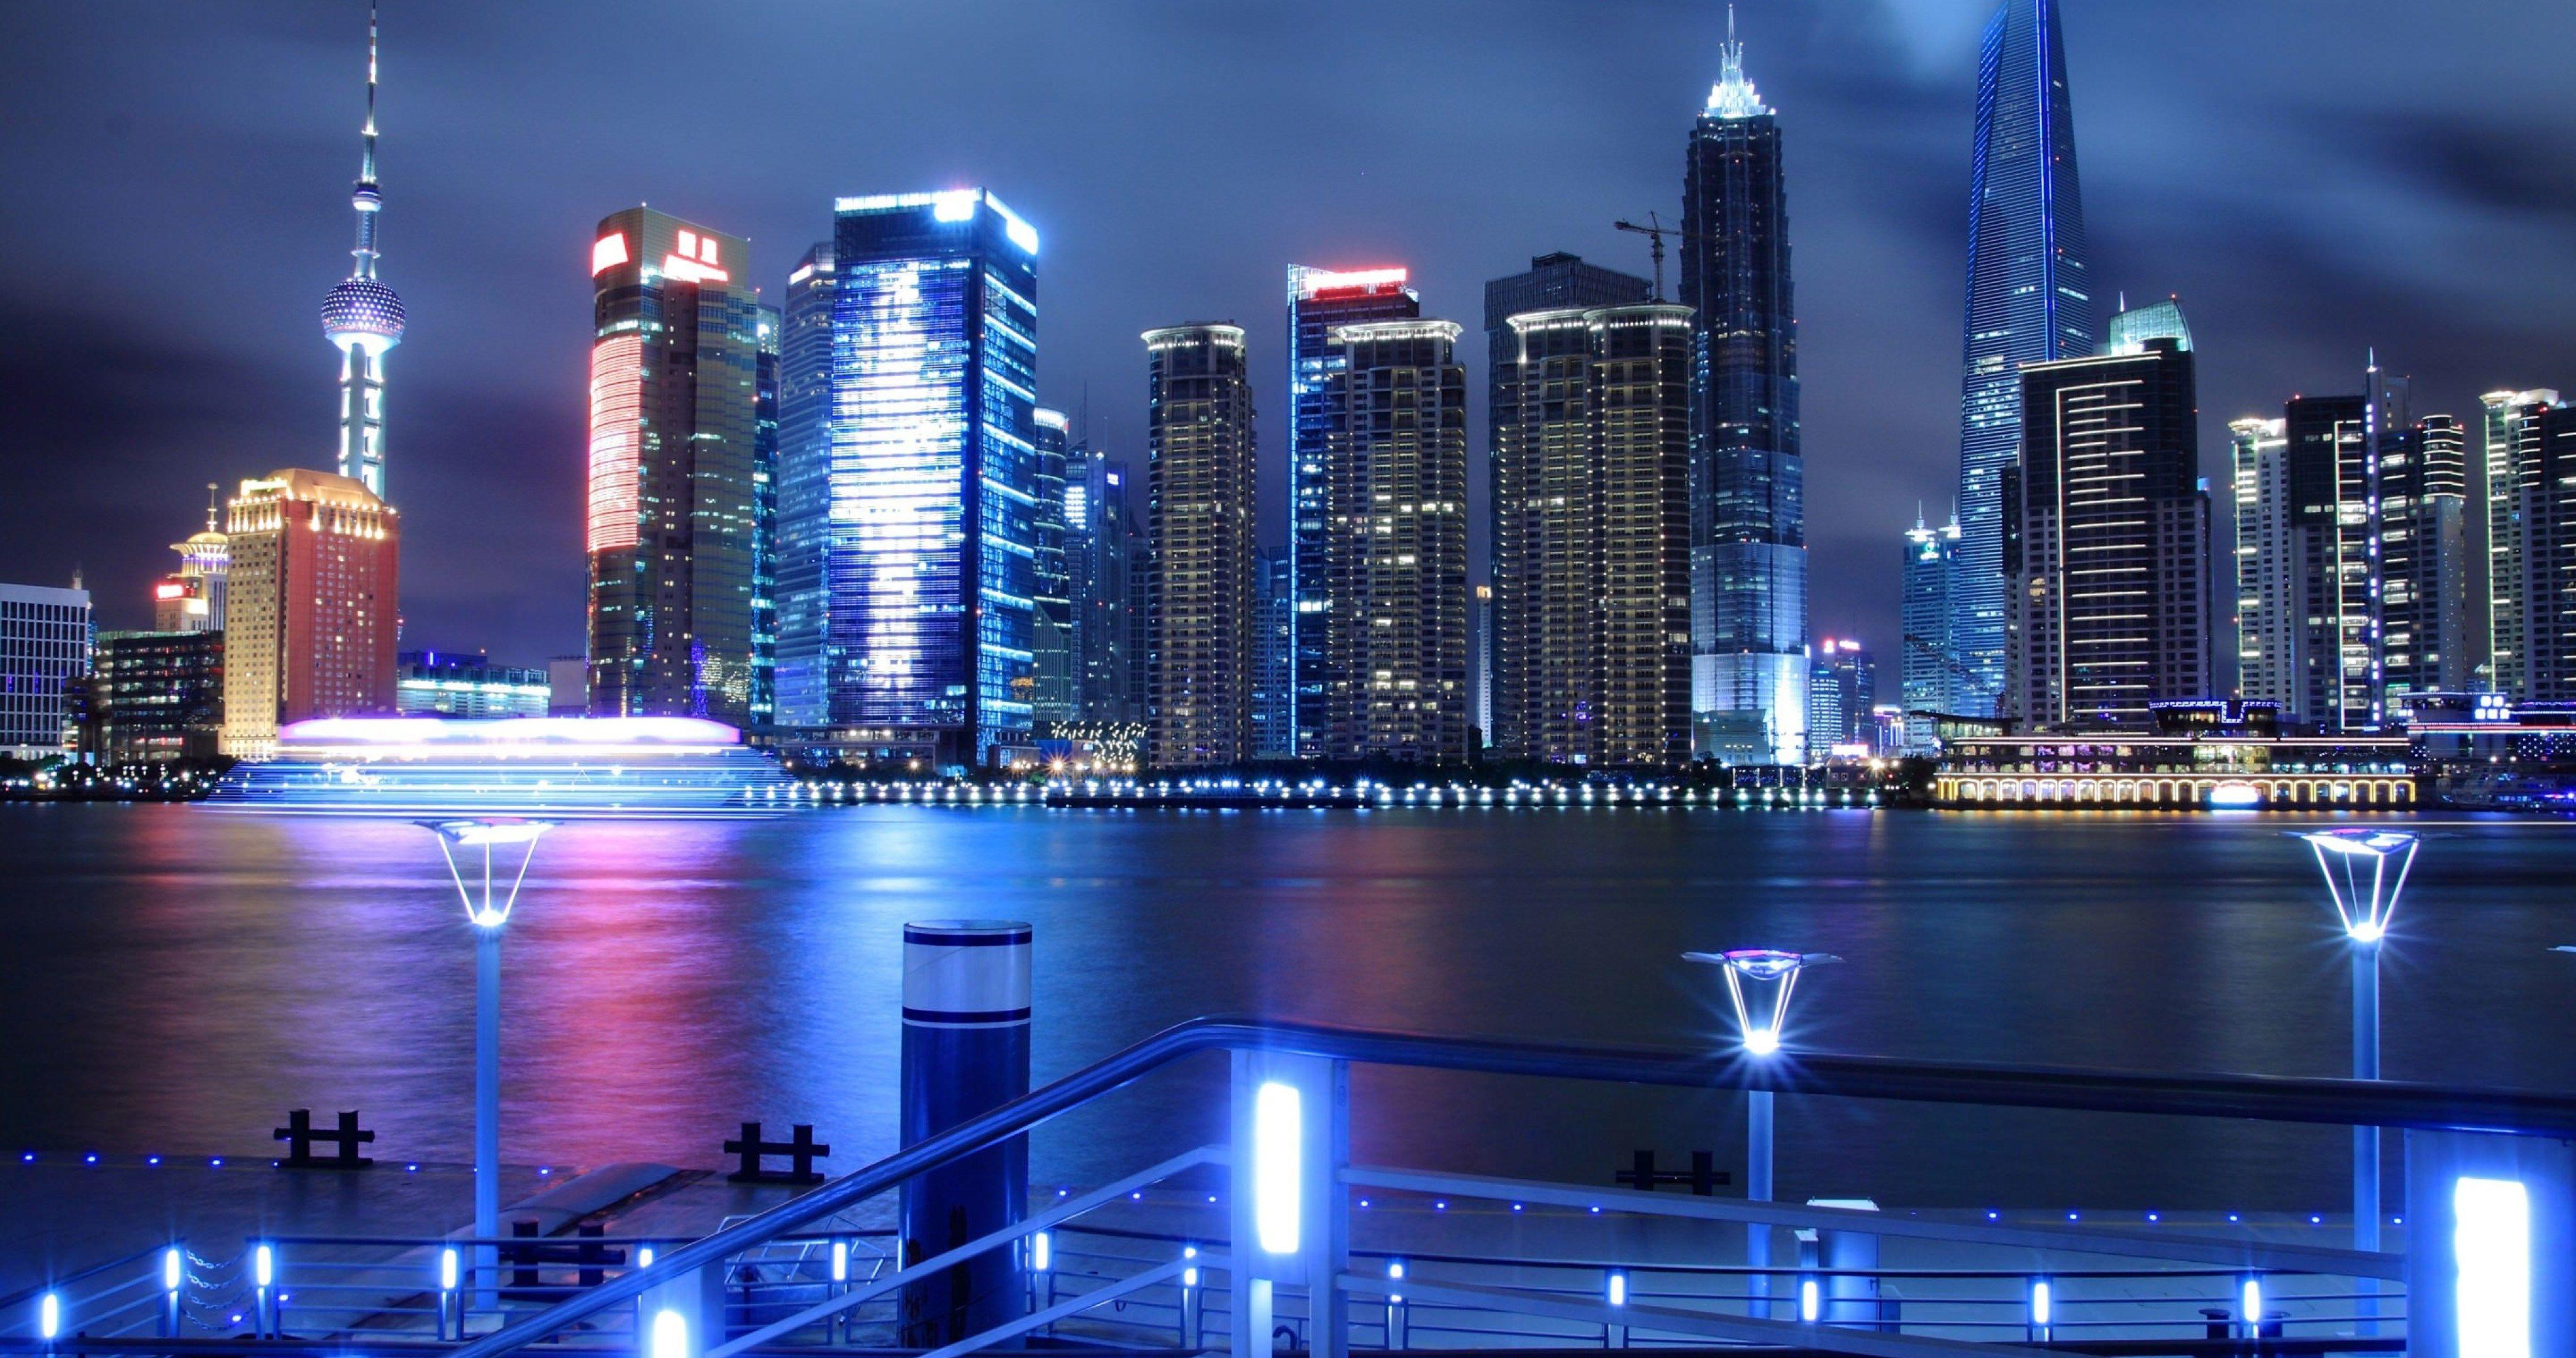 China Shanghai City 4k Ultra Hd Wallpaper Shanghai City Shanghai Night Shanghai